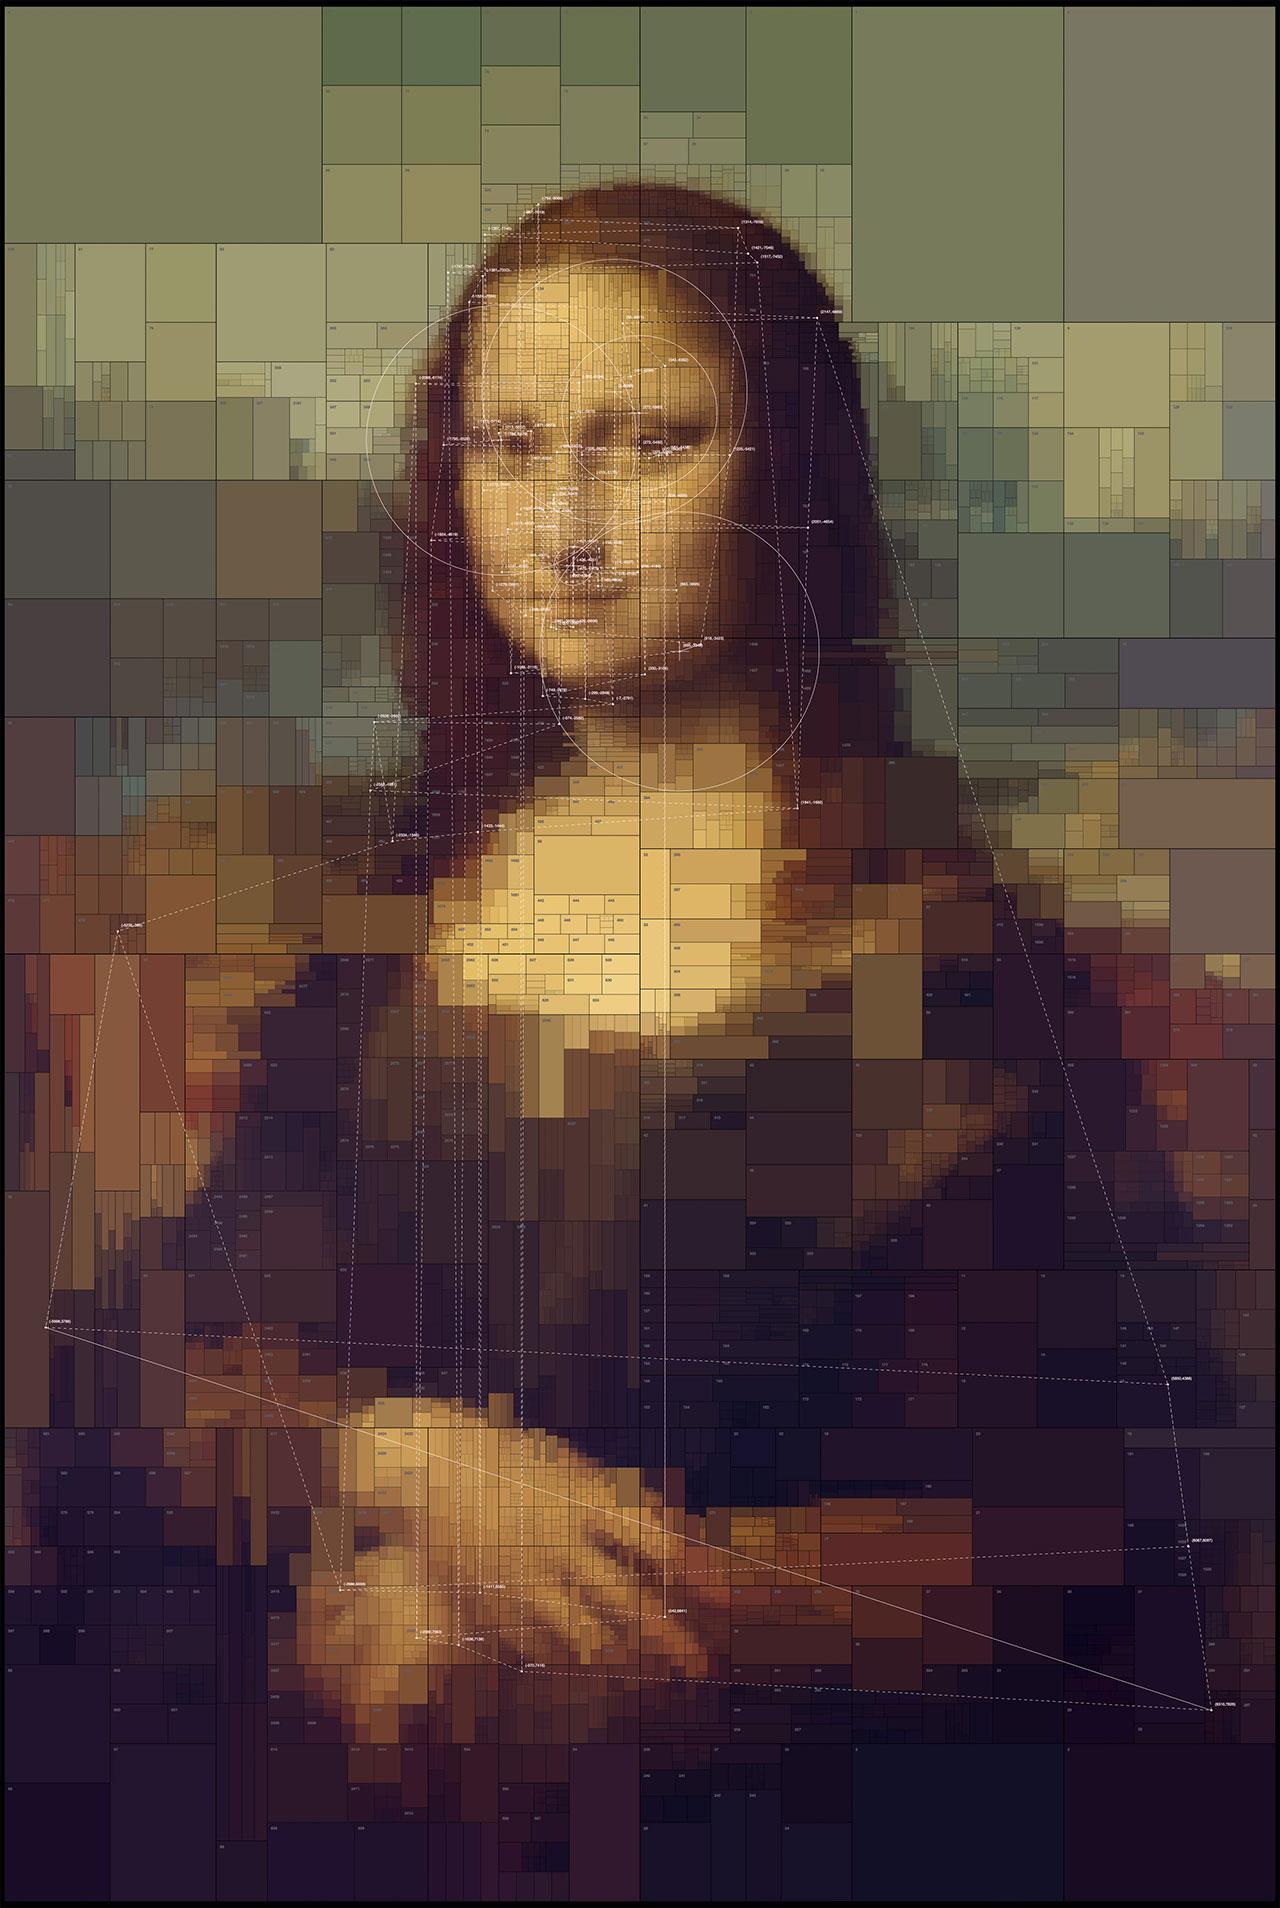 Mona Lisa,from Portraits series by Dimitris Ladopoulos (Original painting by Leonardo da Vinci, 1503–06, perhaps continuing until 1517).